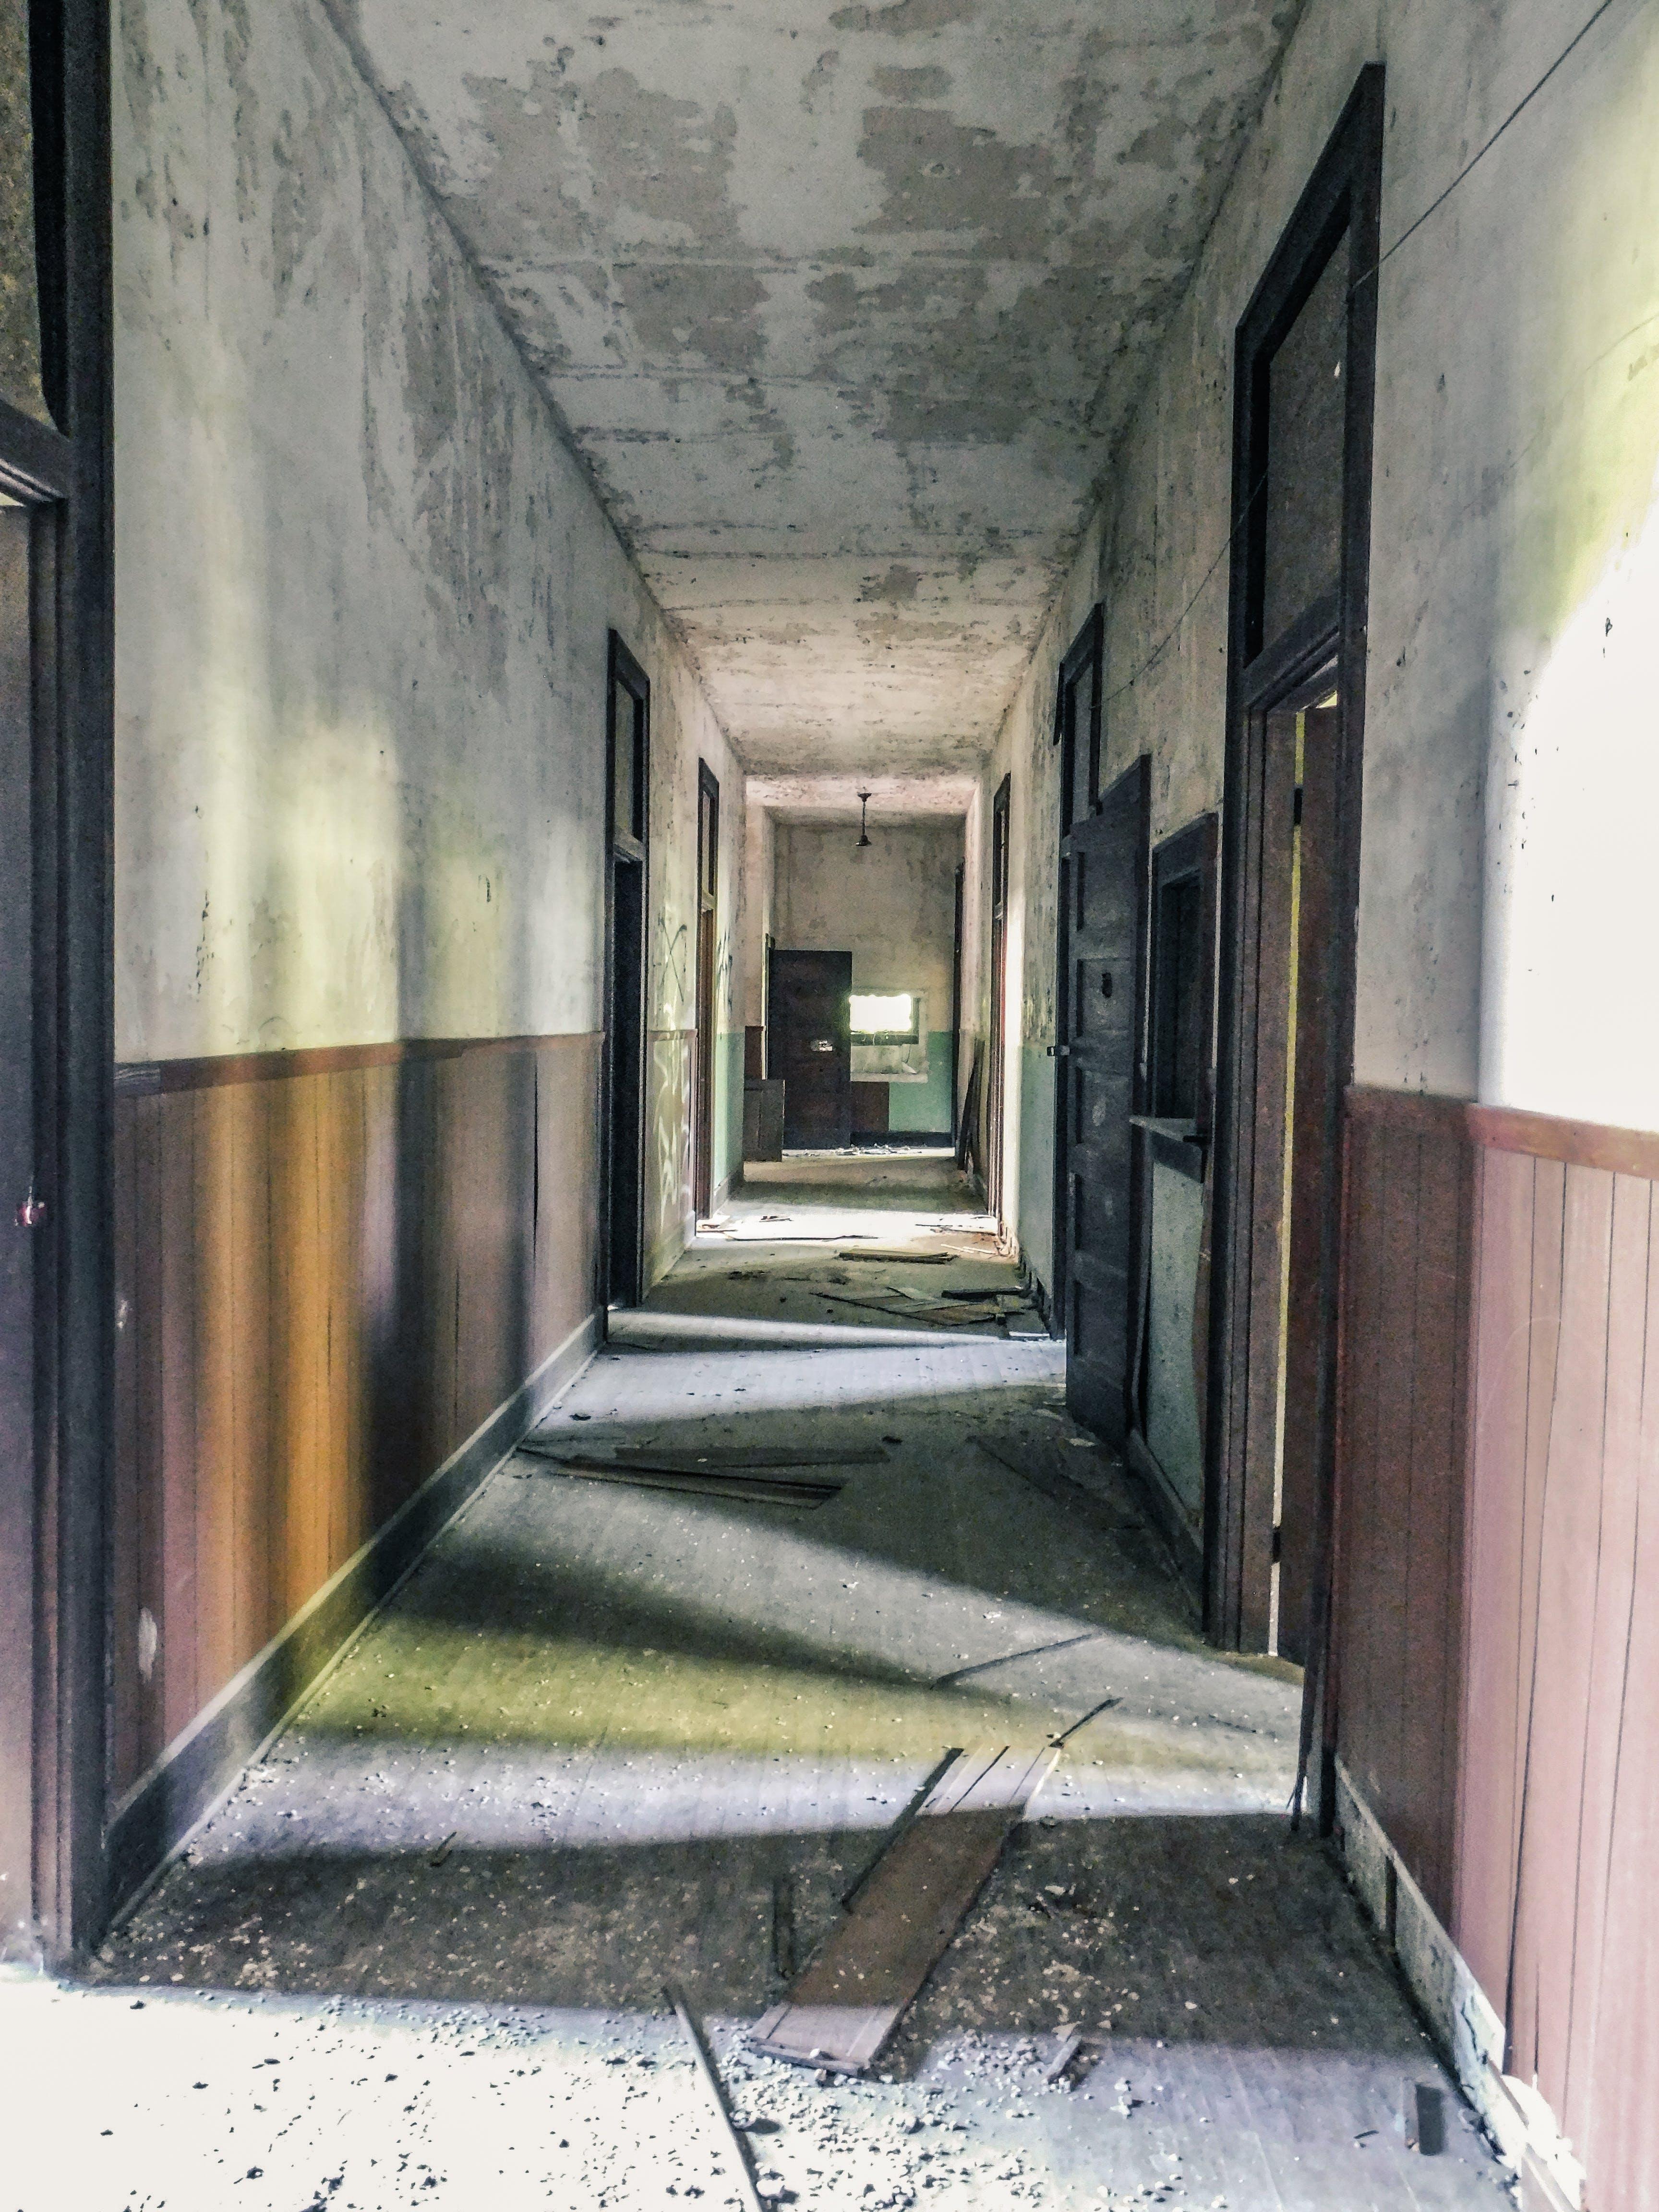 Free stock photo of abandoned building, hall, rundown